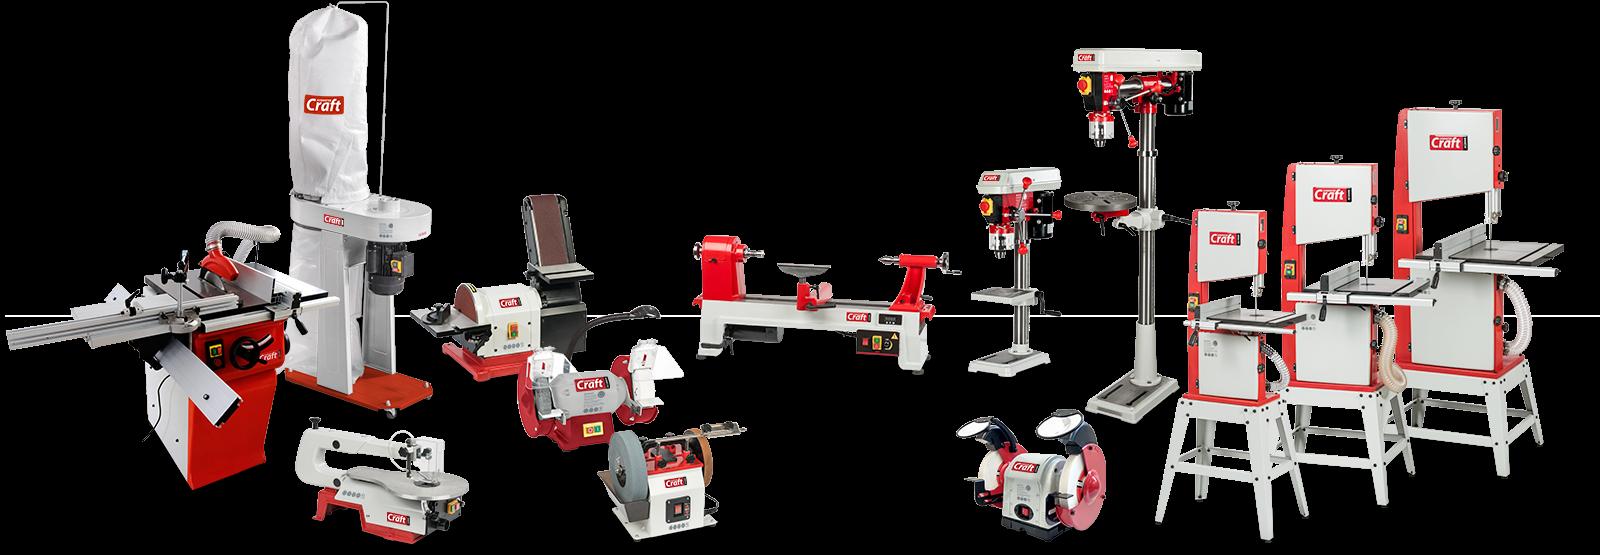 Axminster Craft range